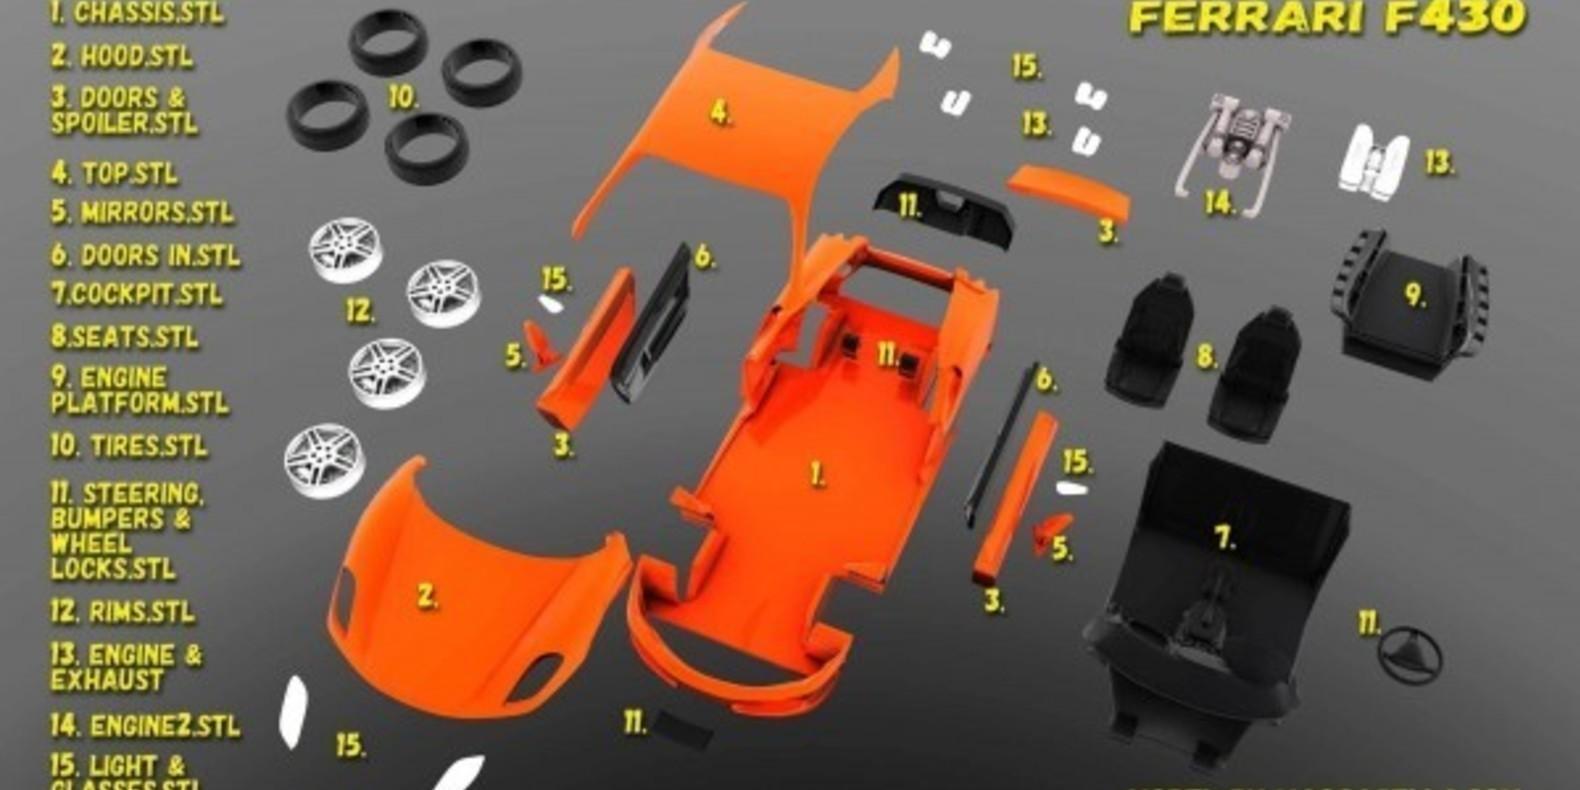 Italian Sports Car 5 - Mao Casella - Cults Cults modélisme 3D printing Impression 3D Fichier 3D